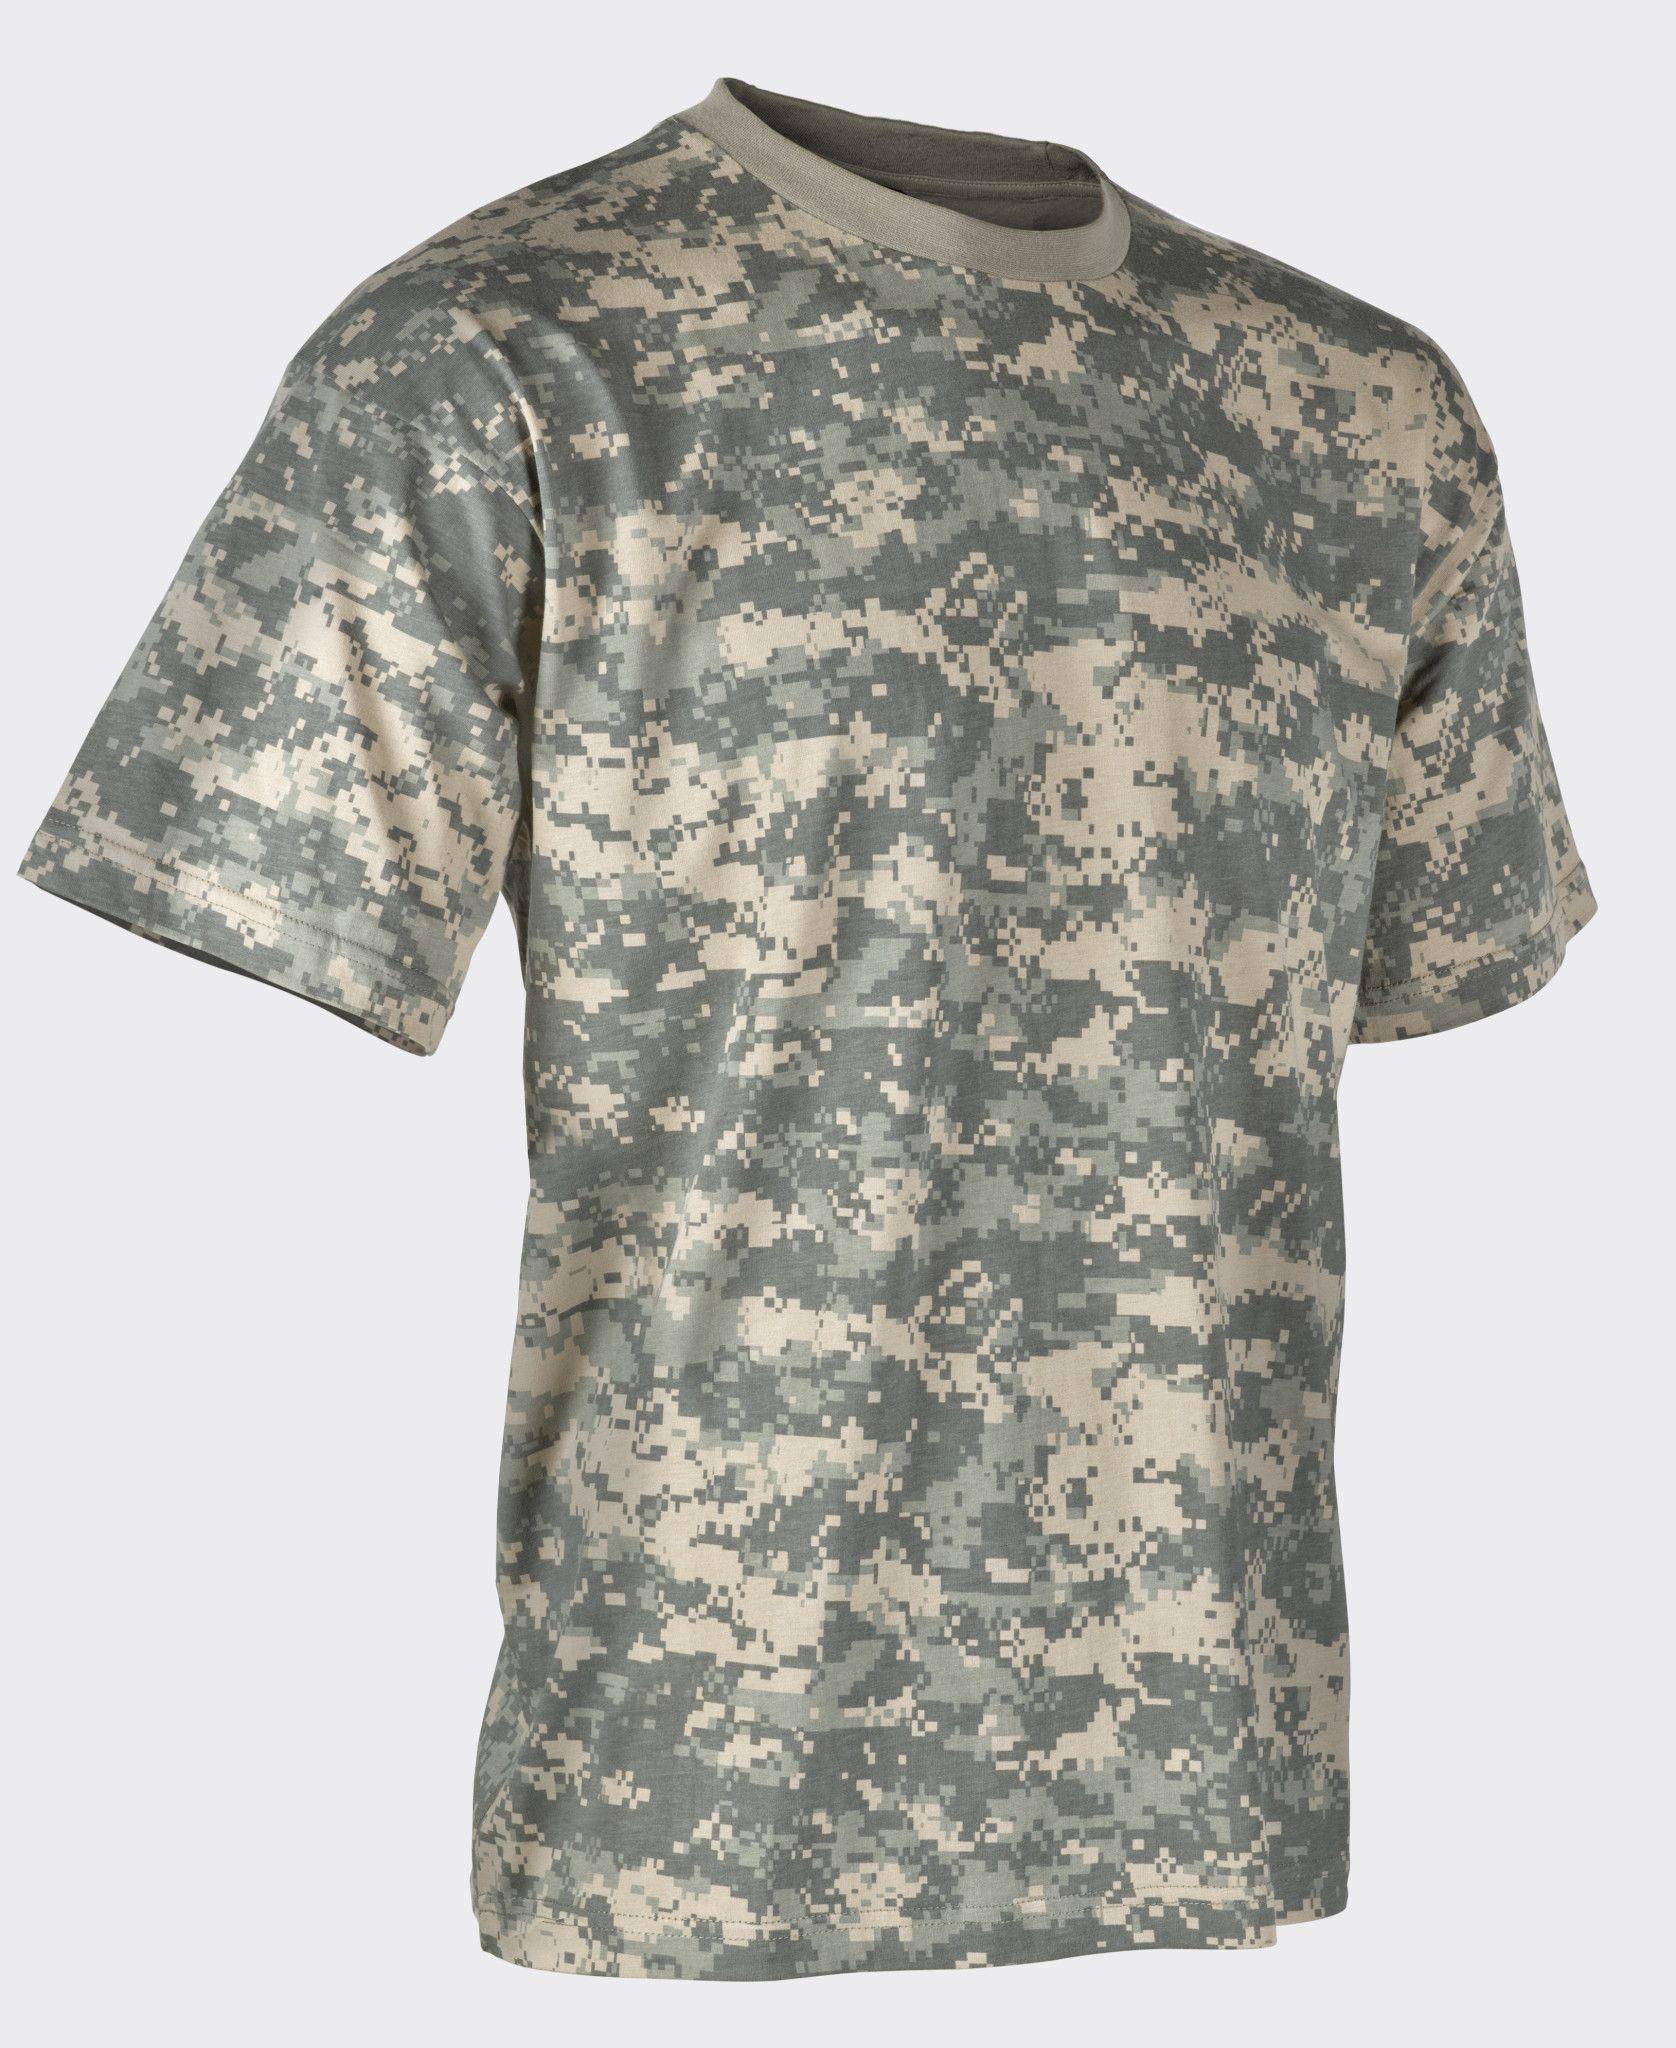 bc595d621e9e Helikon Men'sCotton US Army Camo T-Shirt – UCP ACU | Airsoft ...